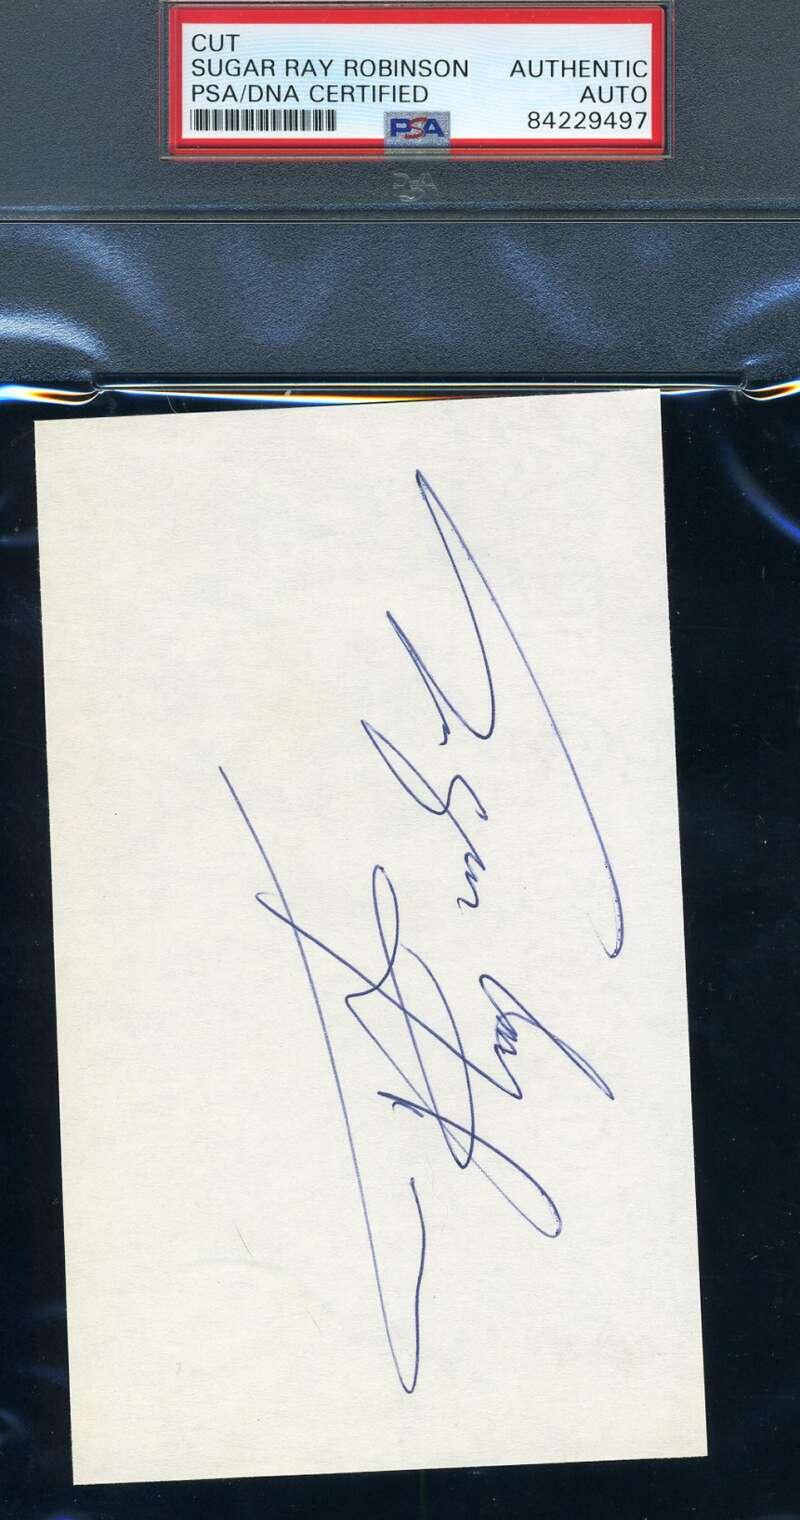 Sugar Ray Robinson PSA DNA Coa Autograph Hand Signed 3x5 Index Card